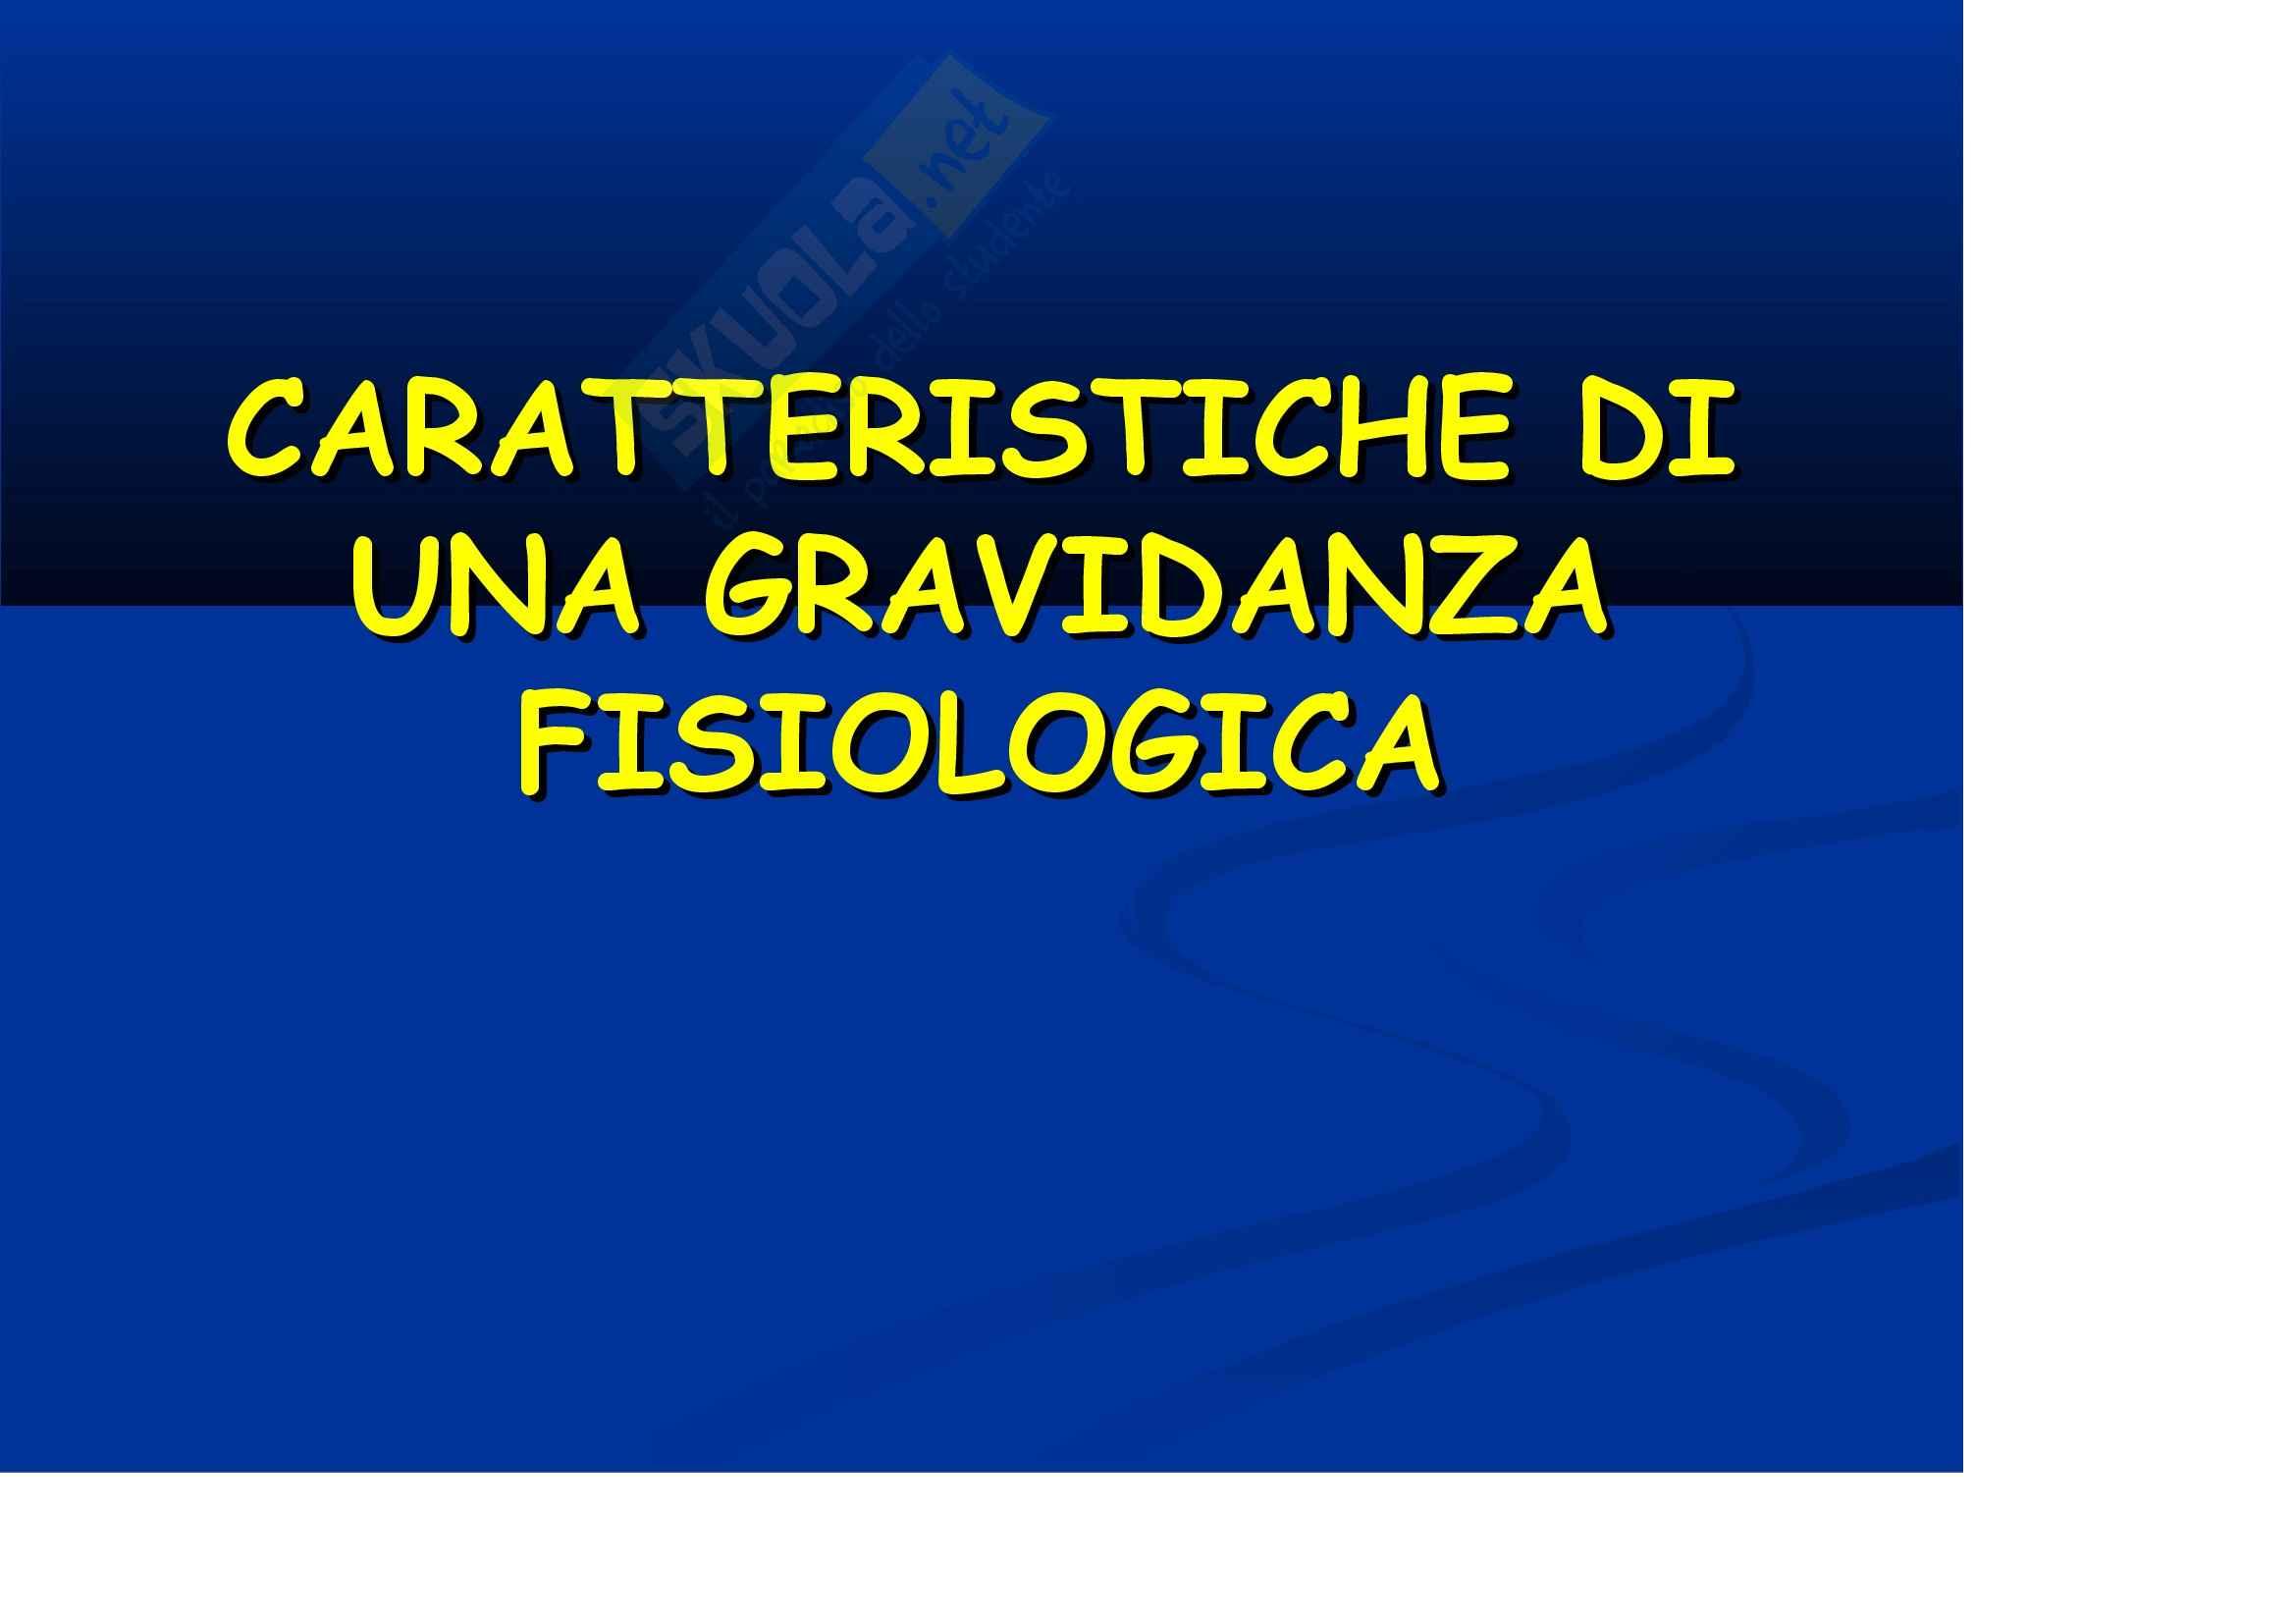 Ginecologia e ostetricia - Fisiopatologia Gravidanza Pag. 2